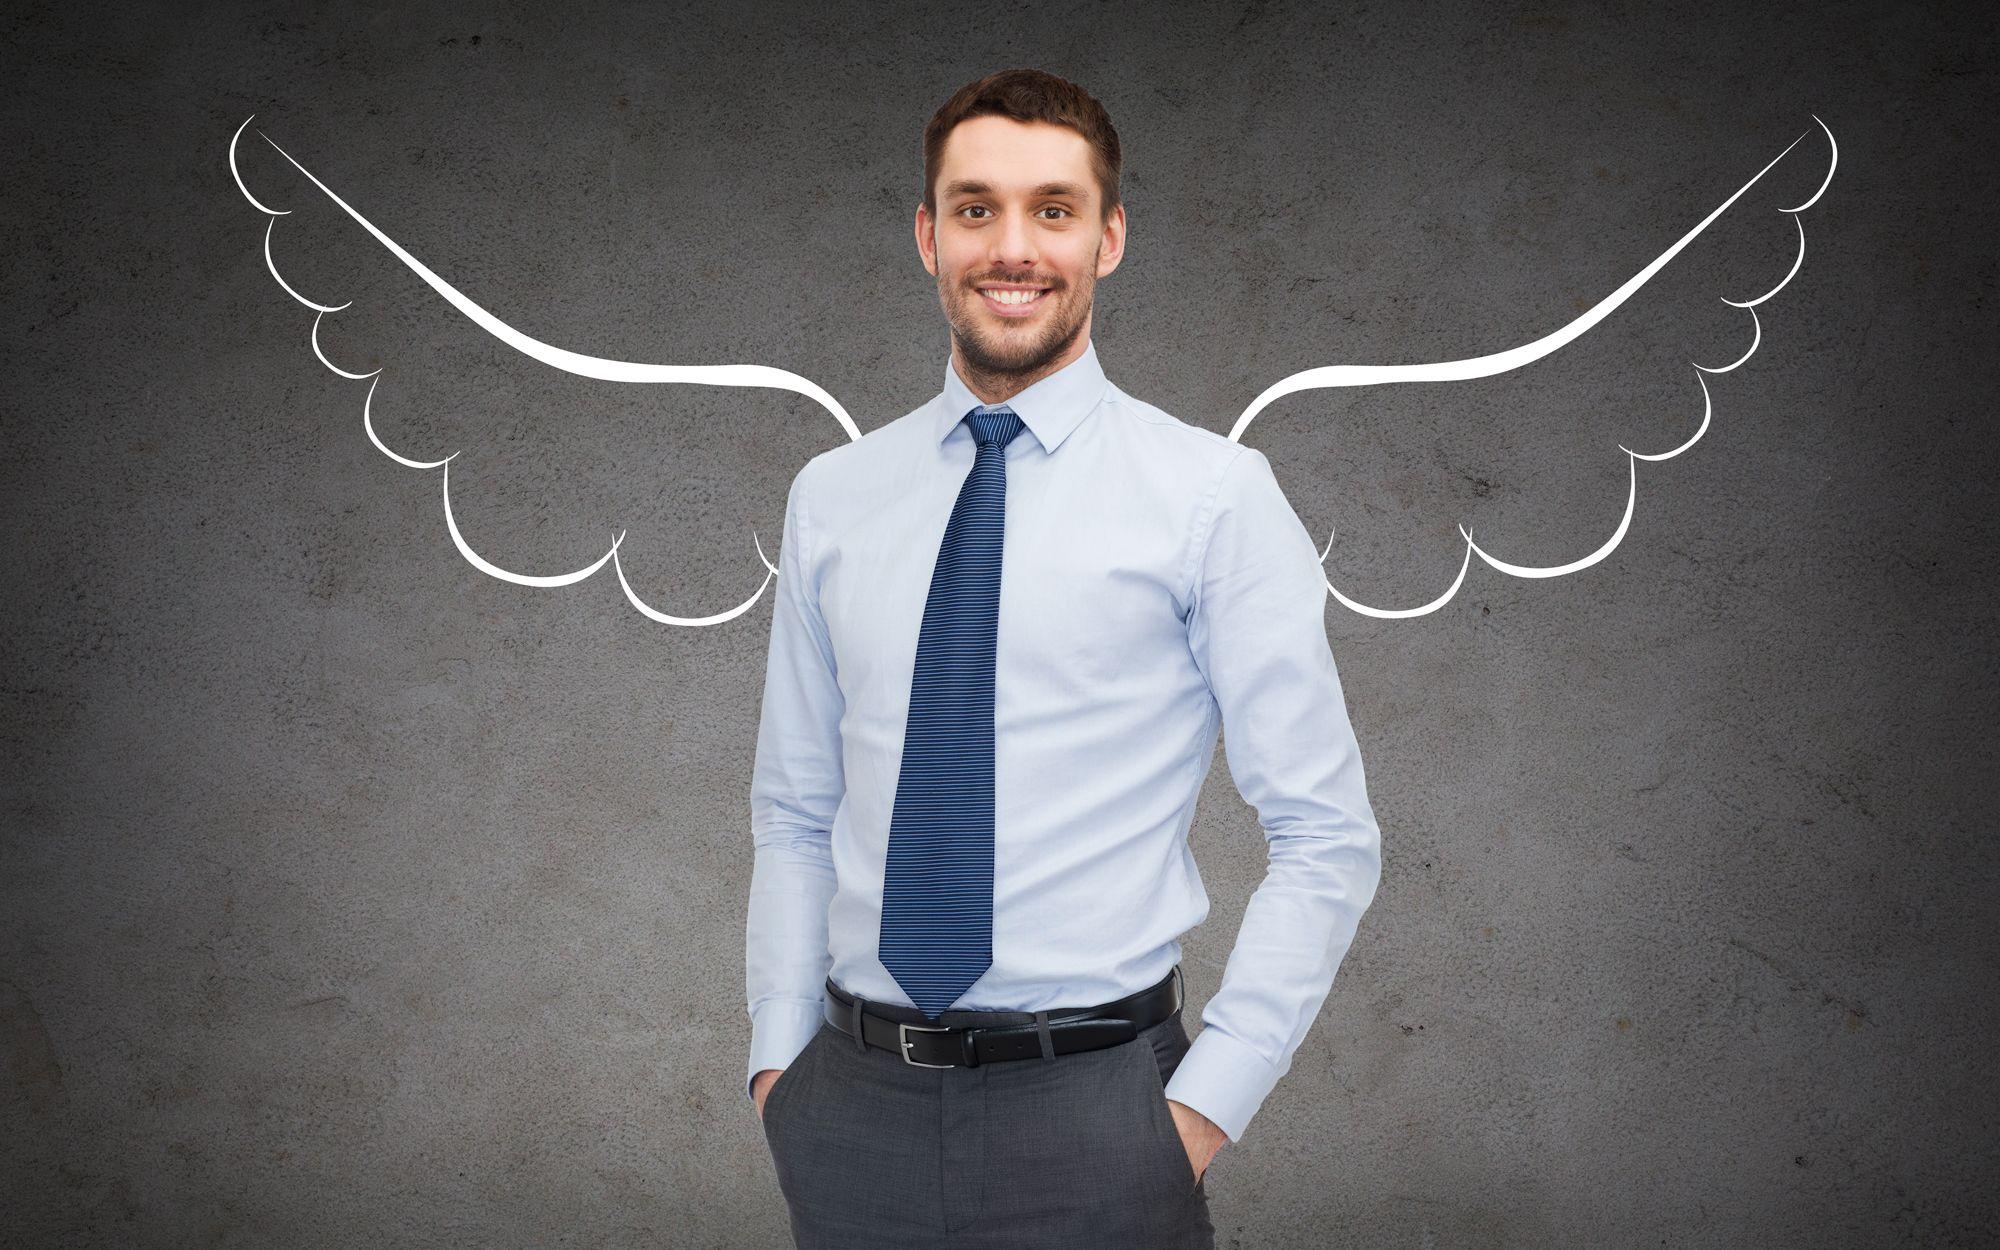 Angel Investor (Inversor ángel) 1